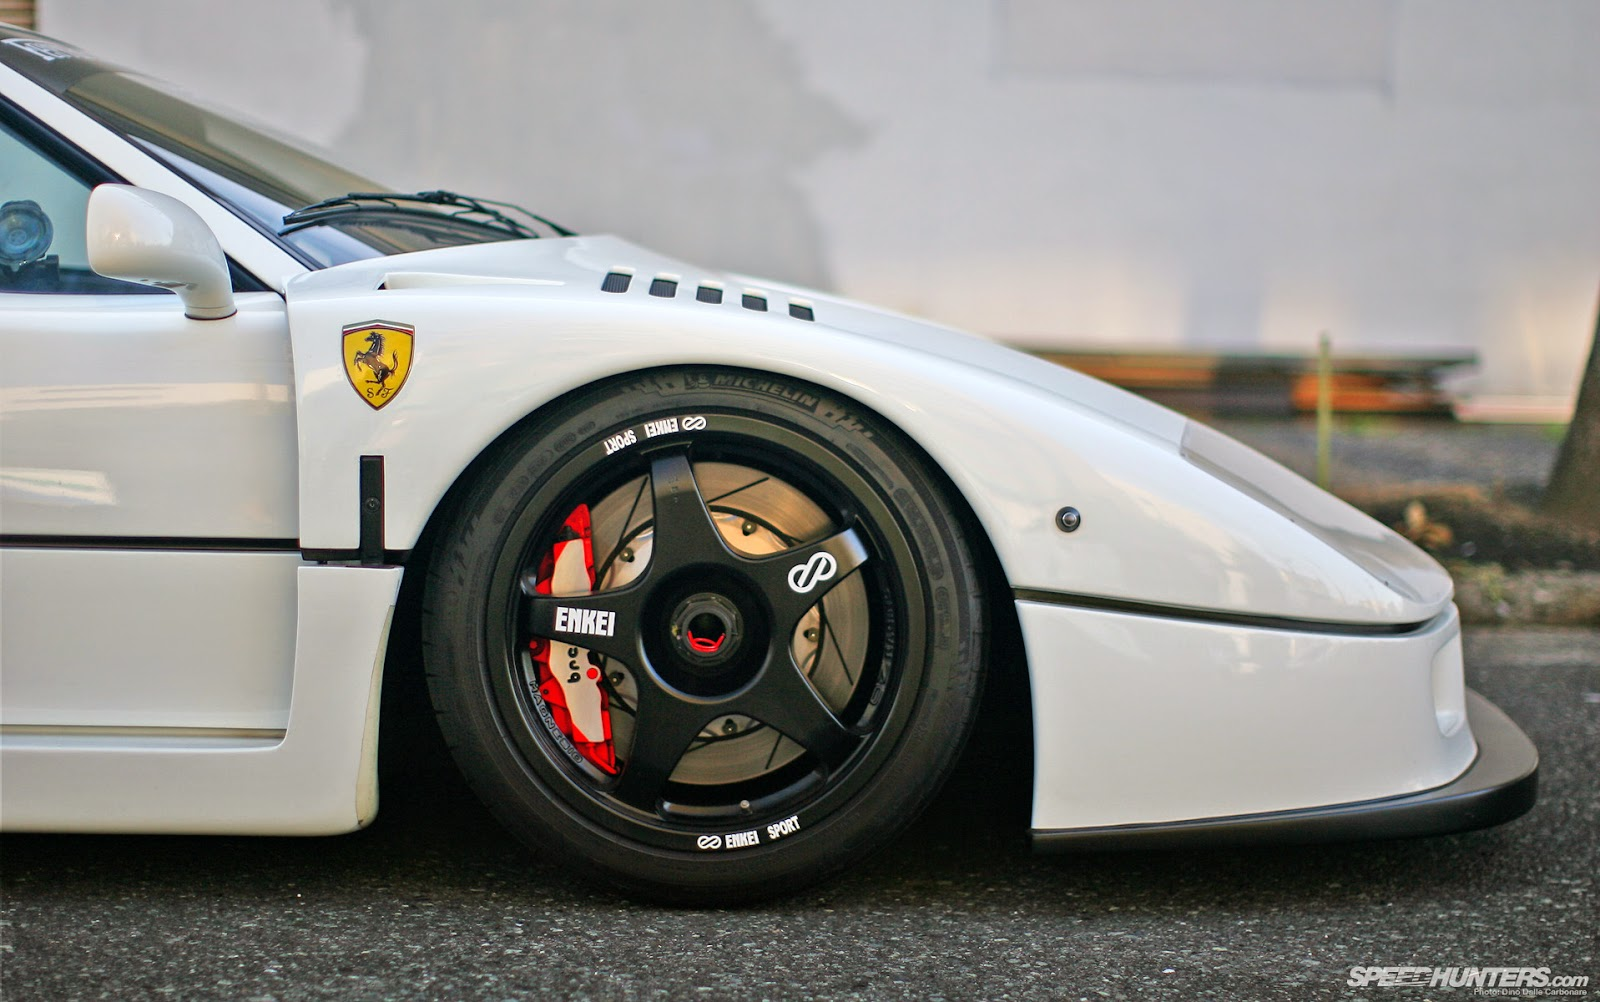 Ferrari F40 Liberty Walk - Chef d'oeuvre ou hérésie ? 6